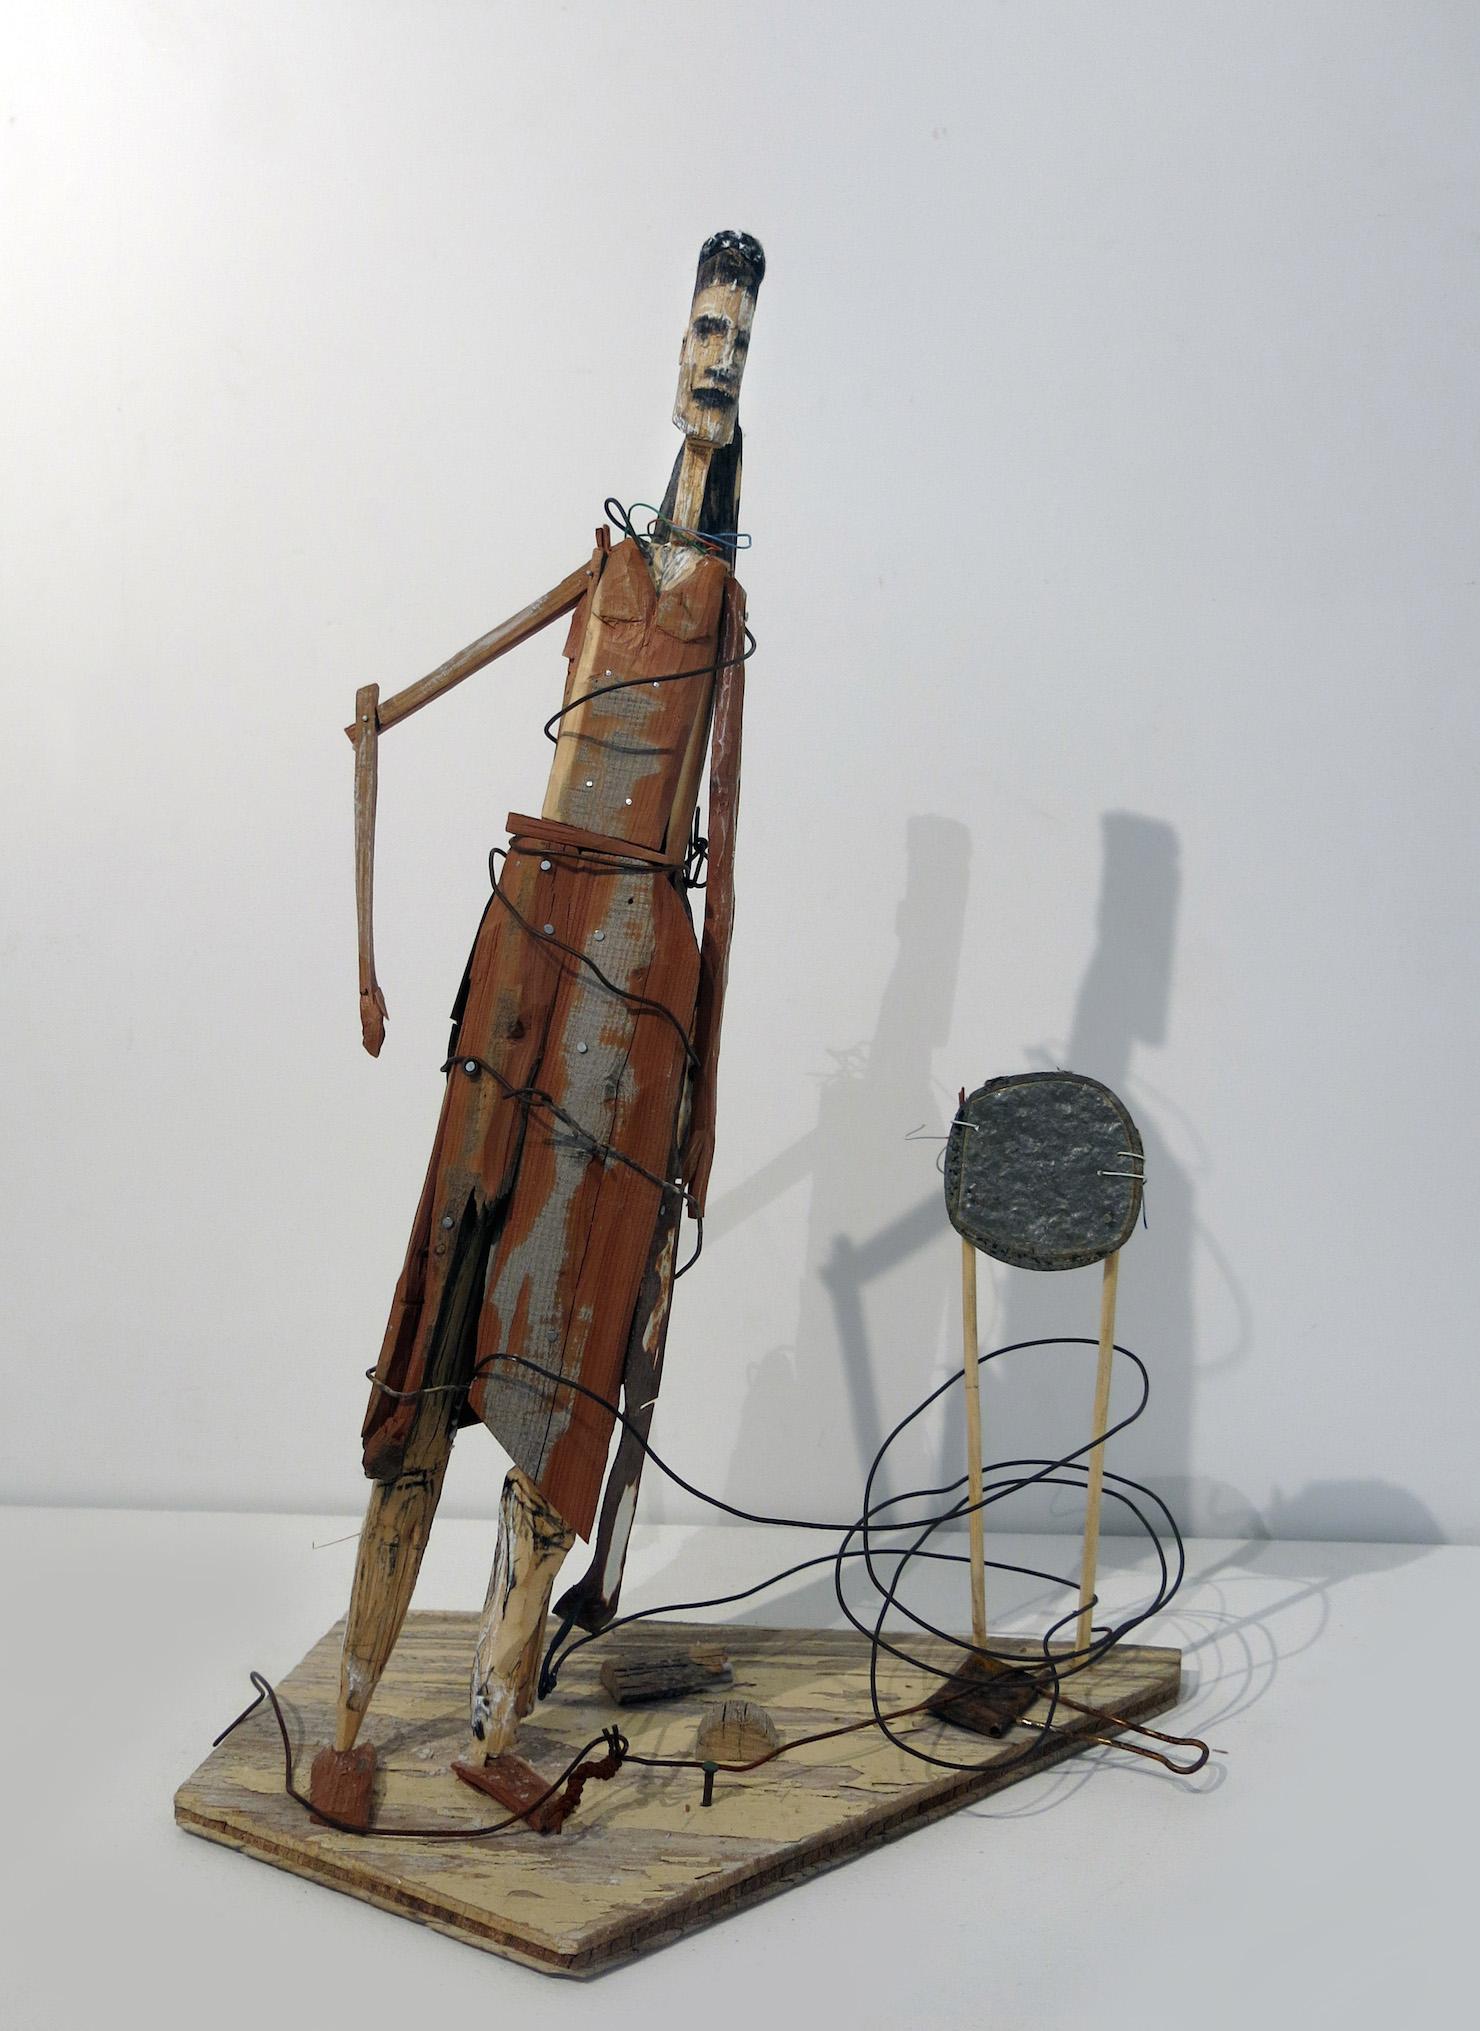 Matt Blackwell, Black Forty (Santos Figure), 2016, wood, wire, charcoal, pastel, 21h x 12.5w x 8.75d in.